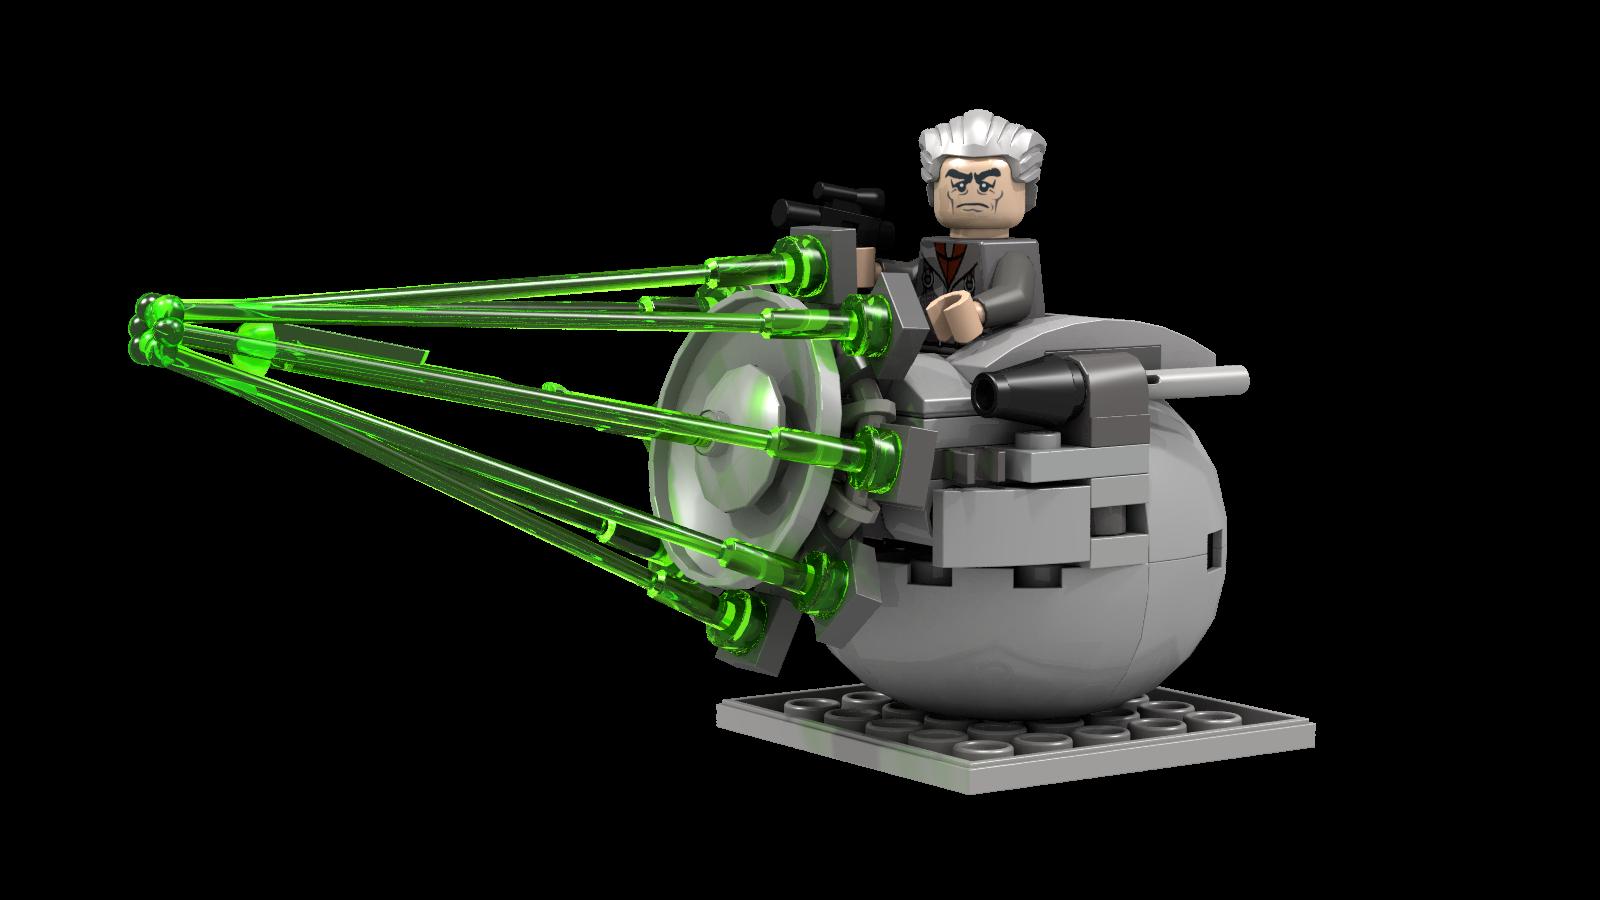 Lego Ideas Product Ideas Death Star Microfighter